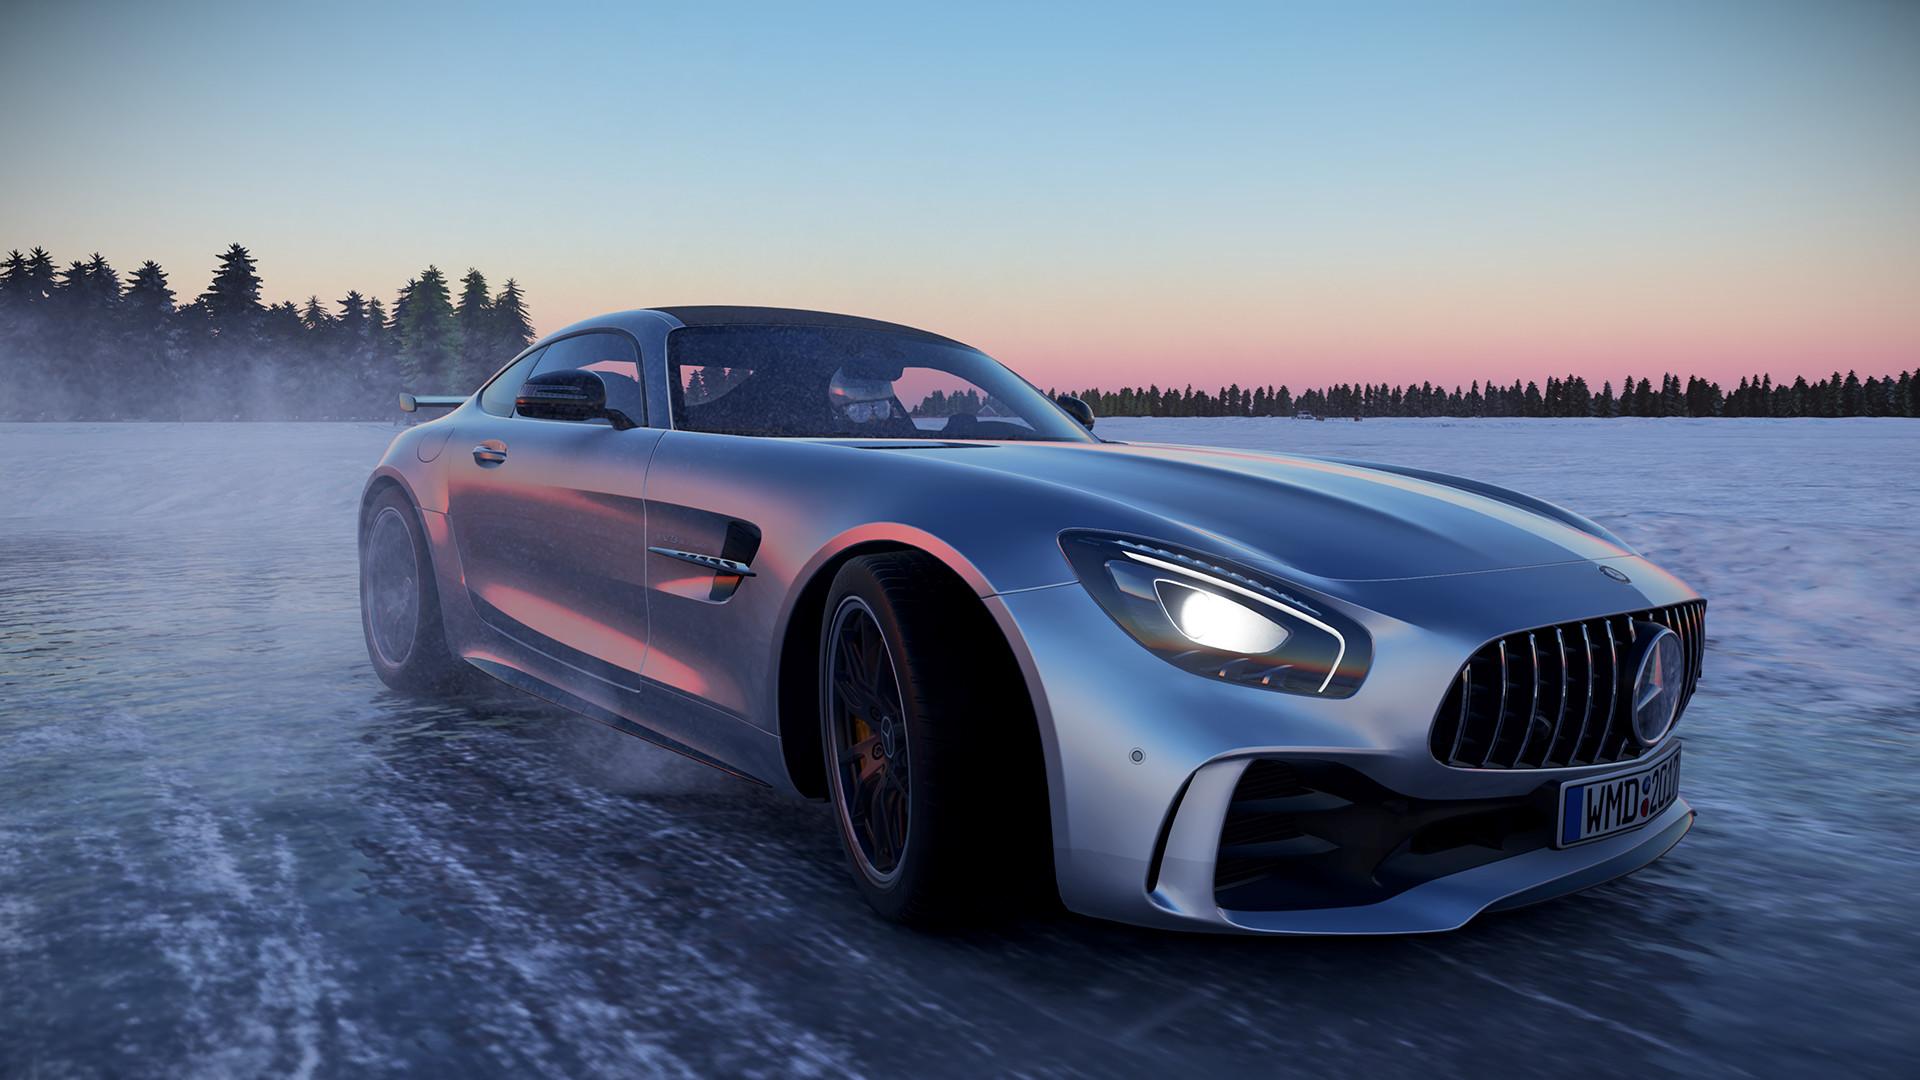 赛车计划2/Project Cars 2